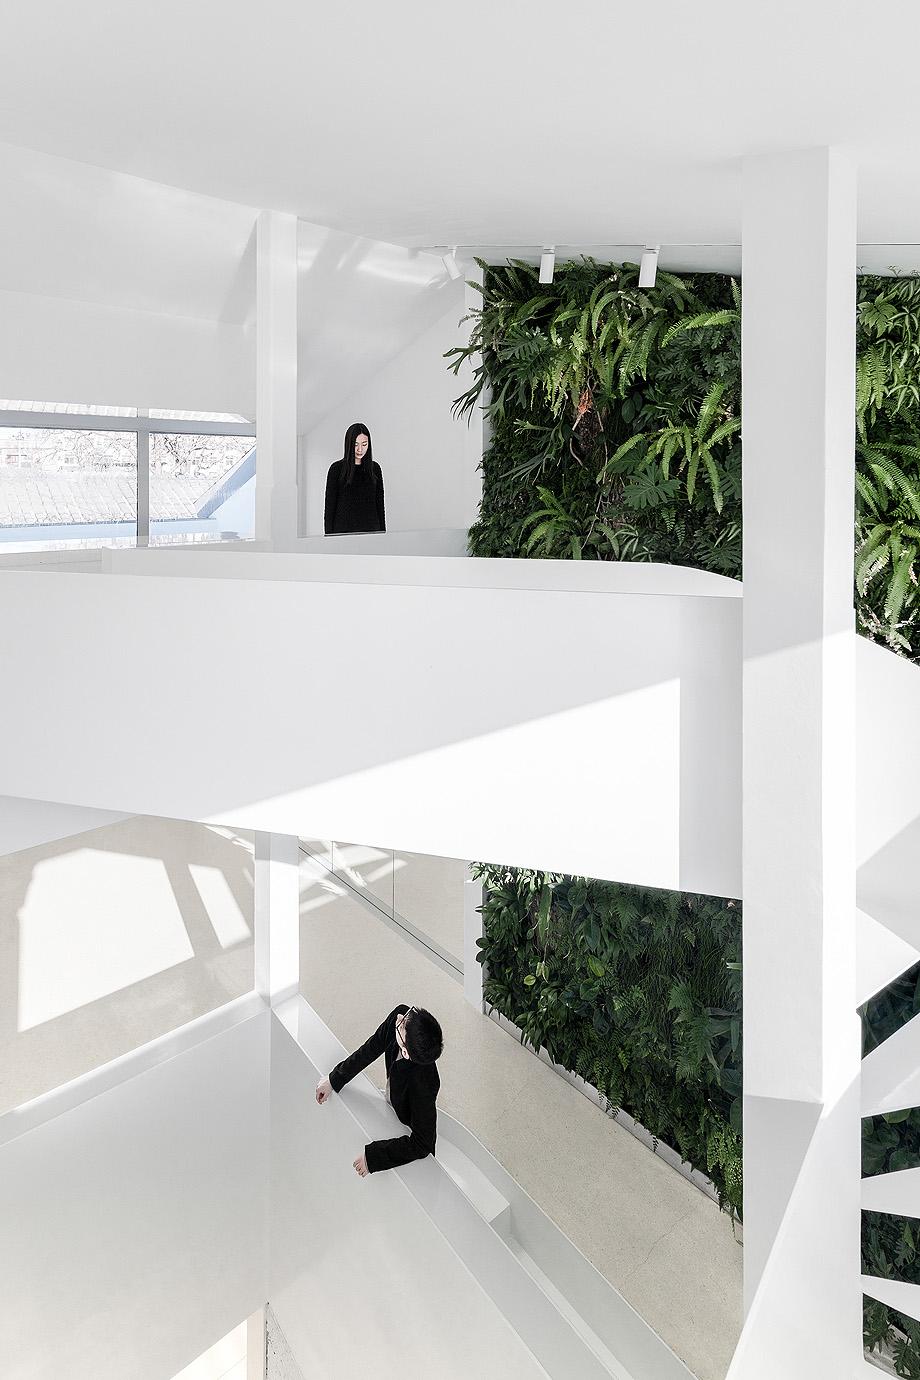 09 mirror garden de archstudio - foto © Wang Ning